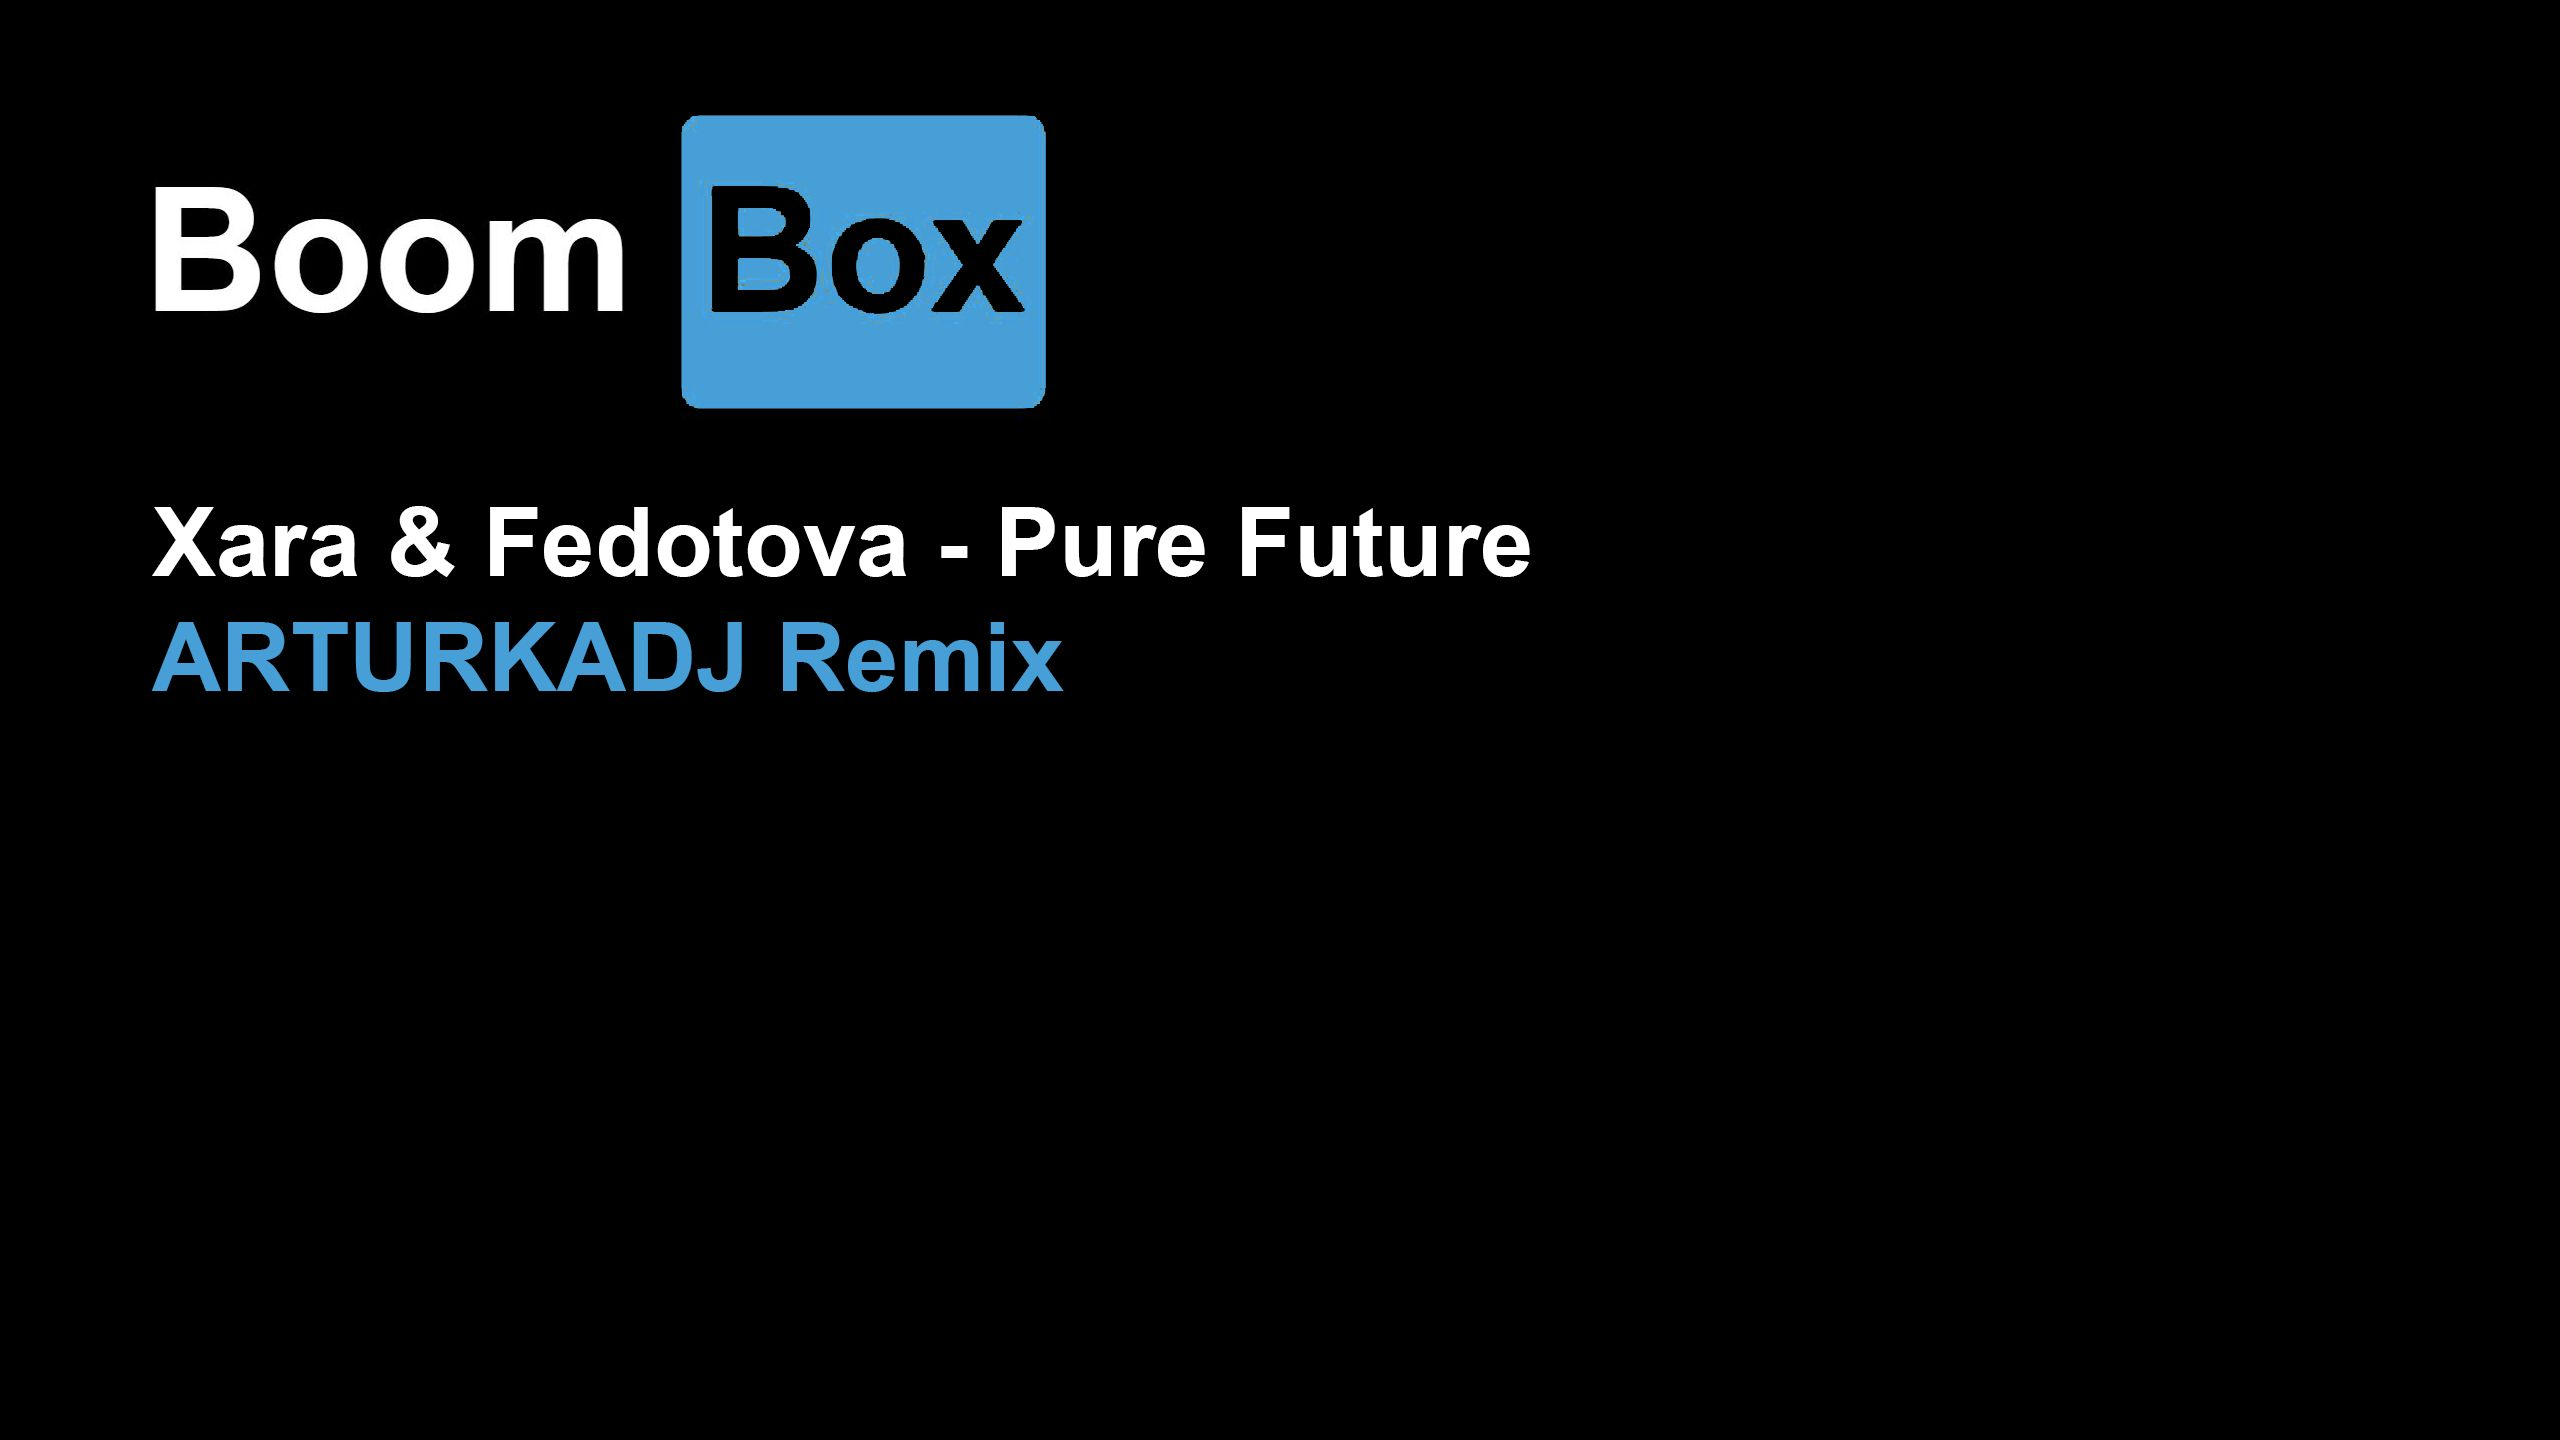 Song: Pure Future Artist: Xara & Fedotova Album: N/A Exact